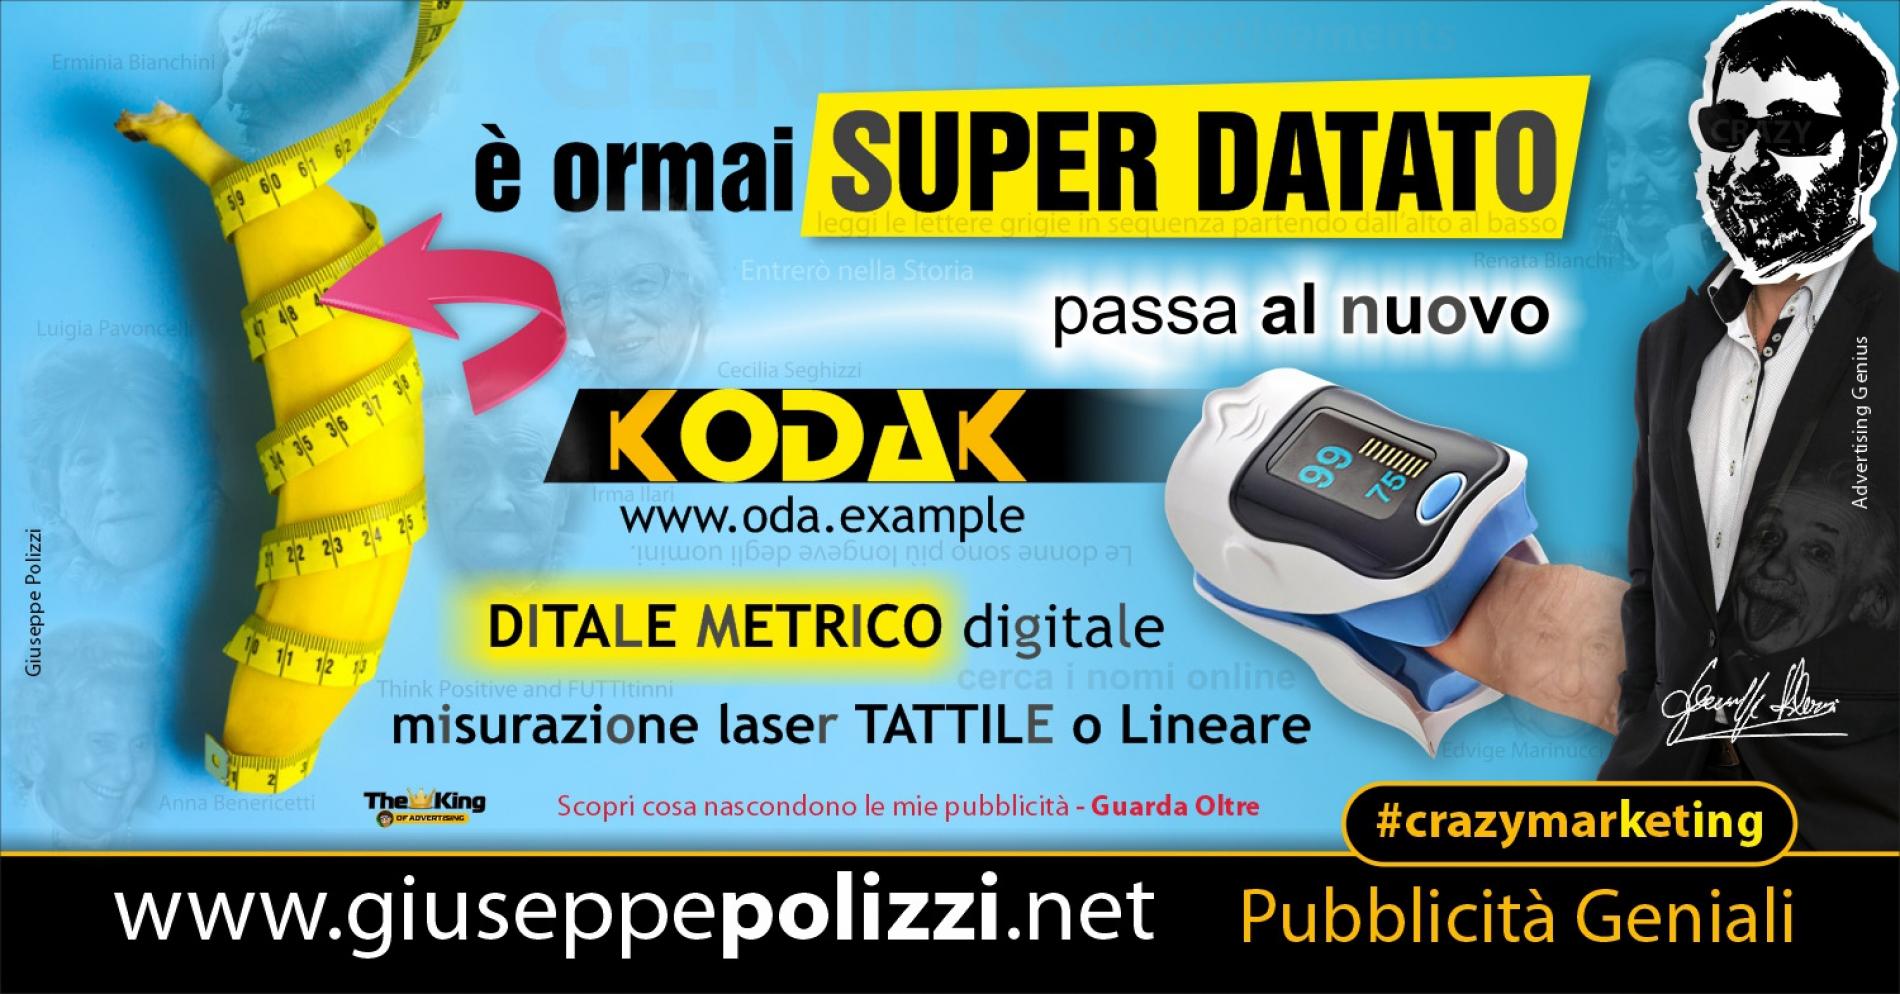 Giuseppe Polizzi Crazymarketing è Super Datato pubblicità geniali